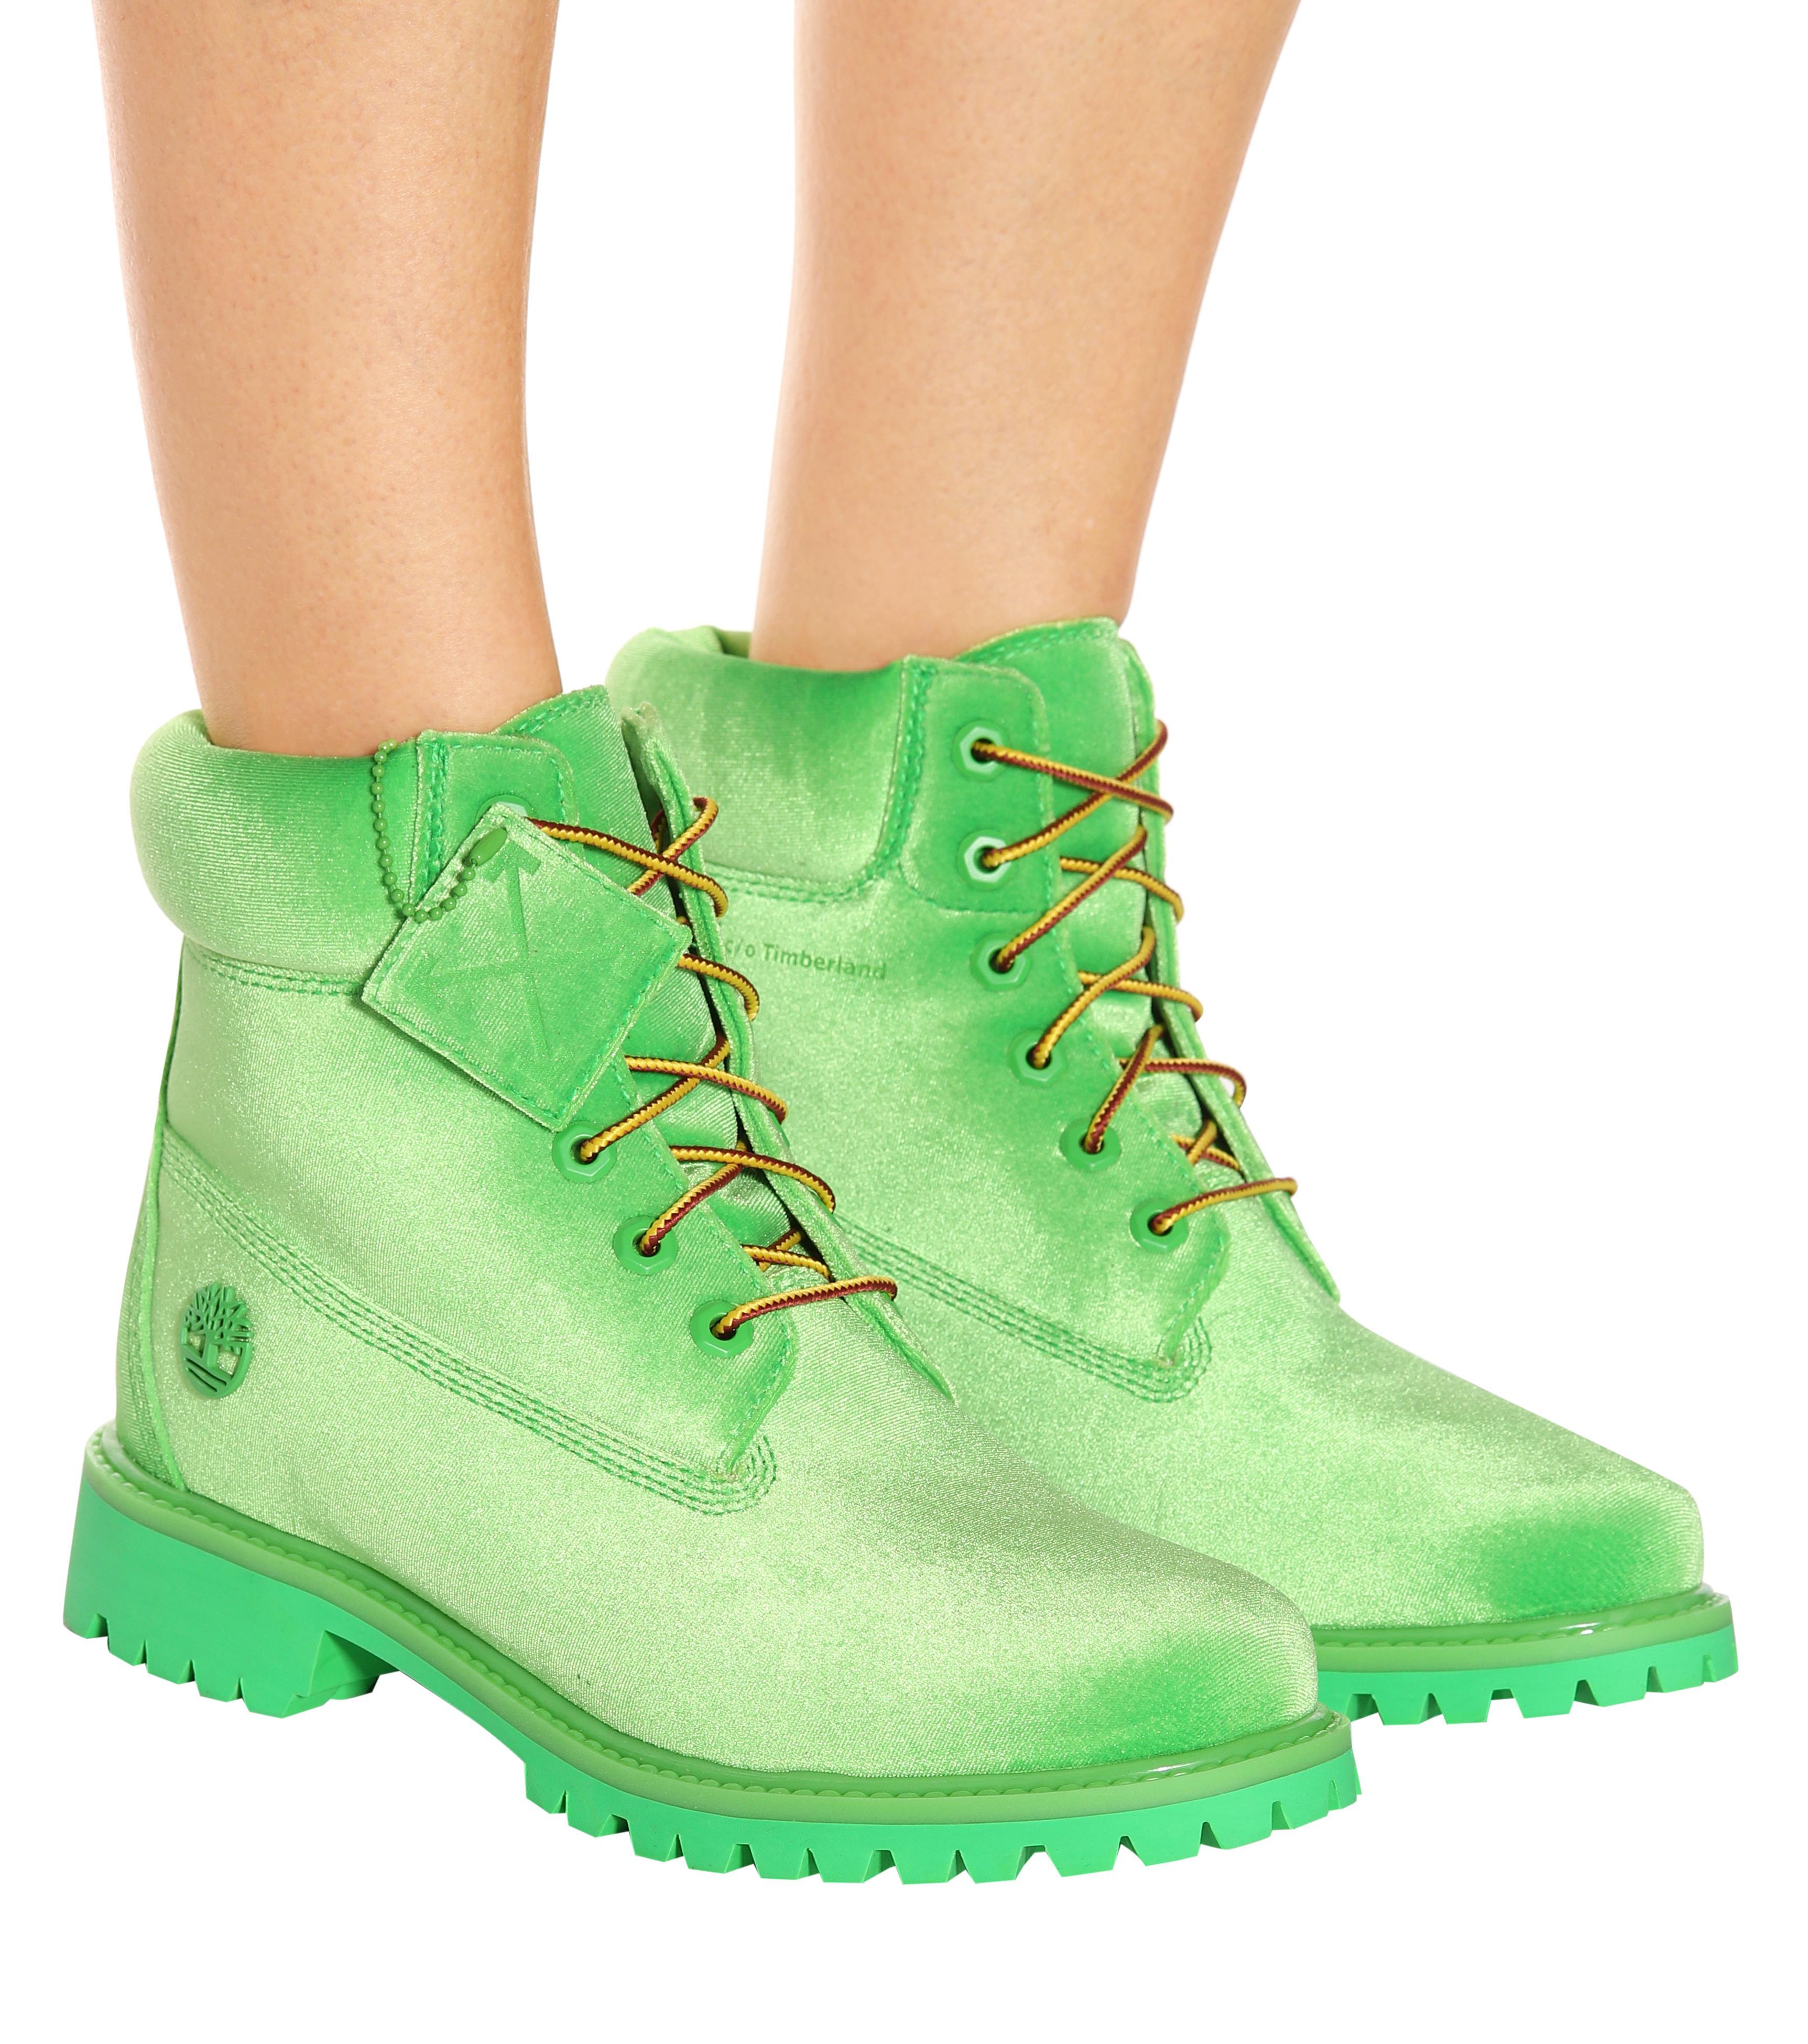 03b1b8322 Off-White c/o Virgil Abloh X Timberland Velvet Ankle Boots in Green ...